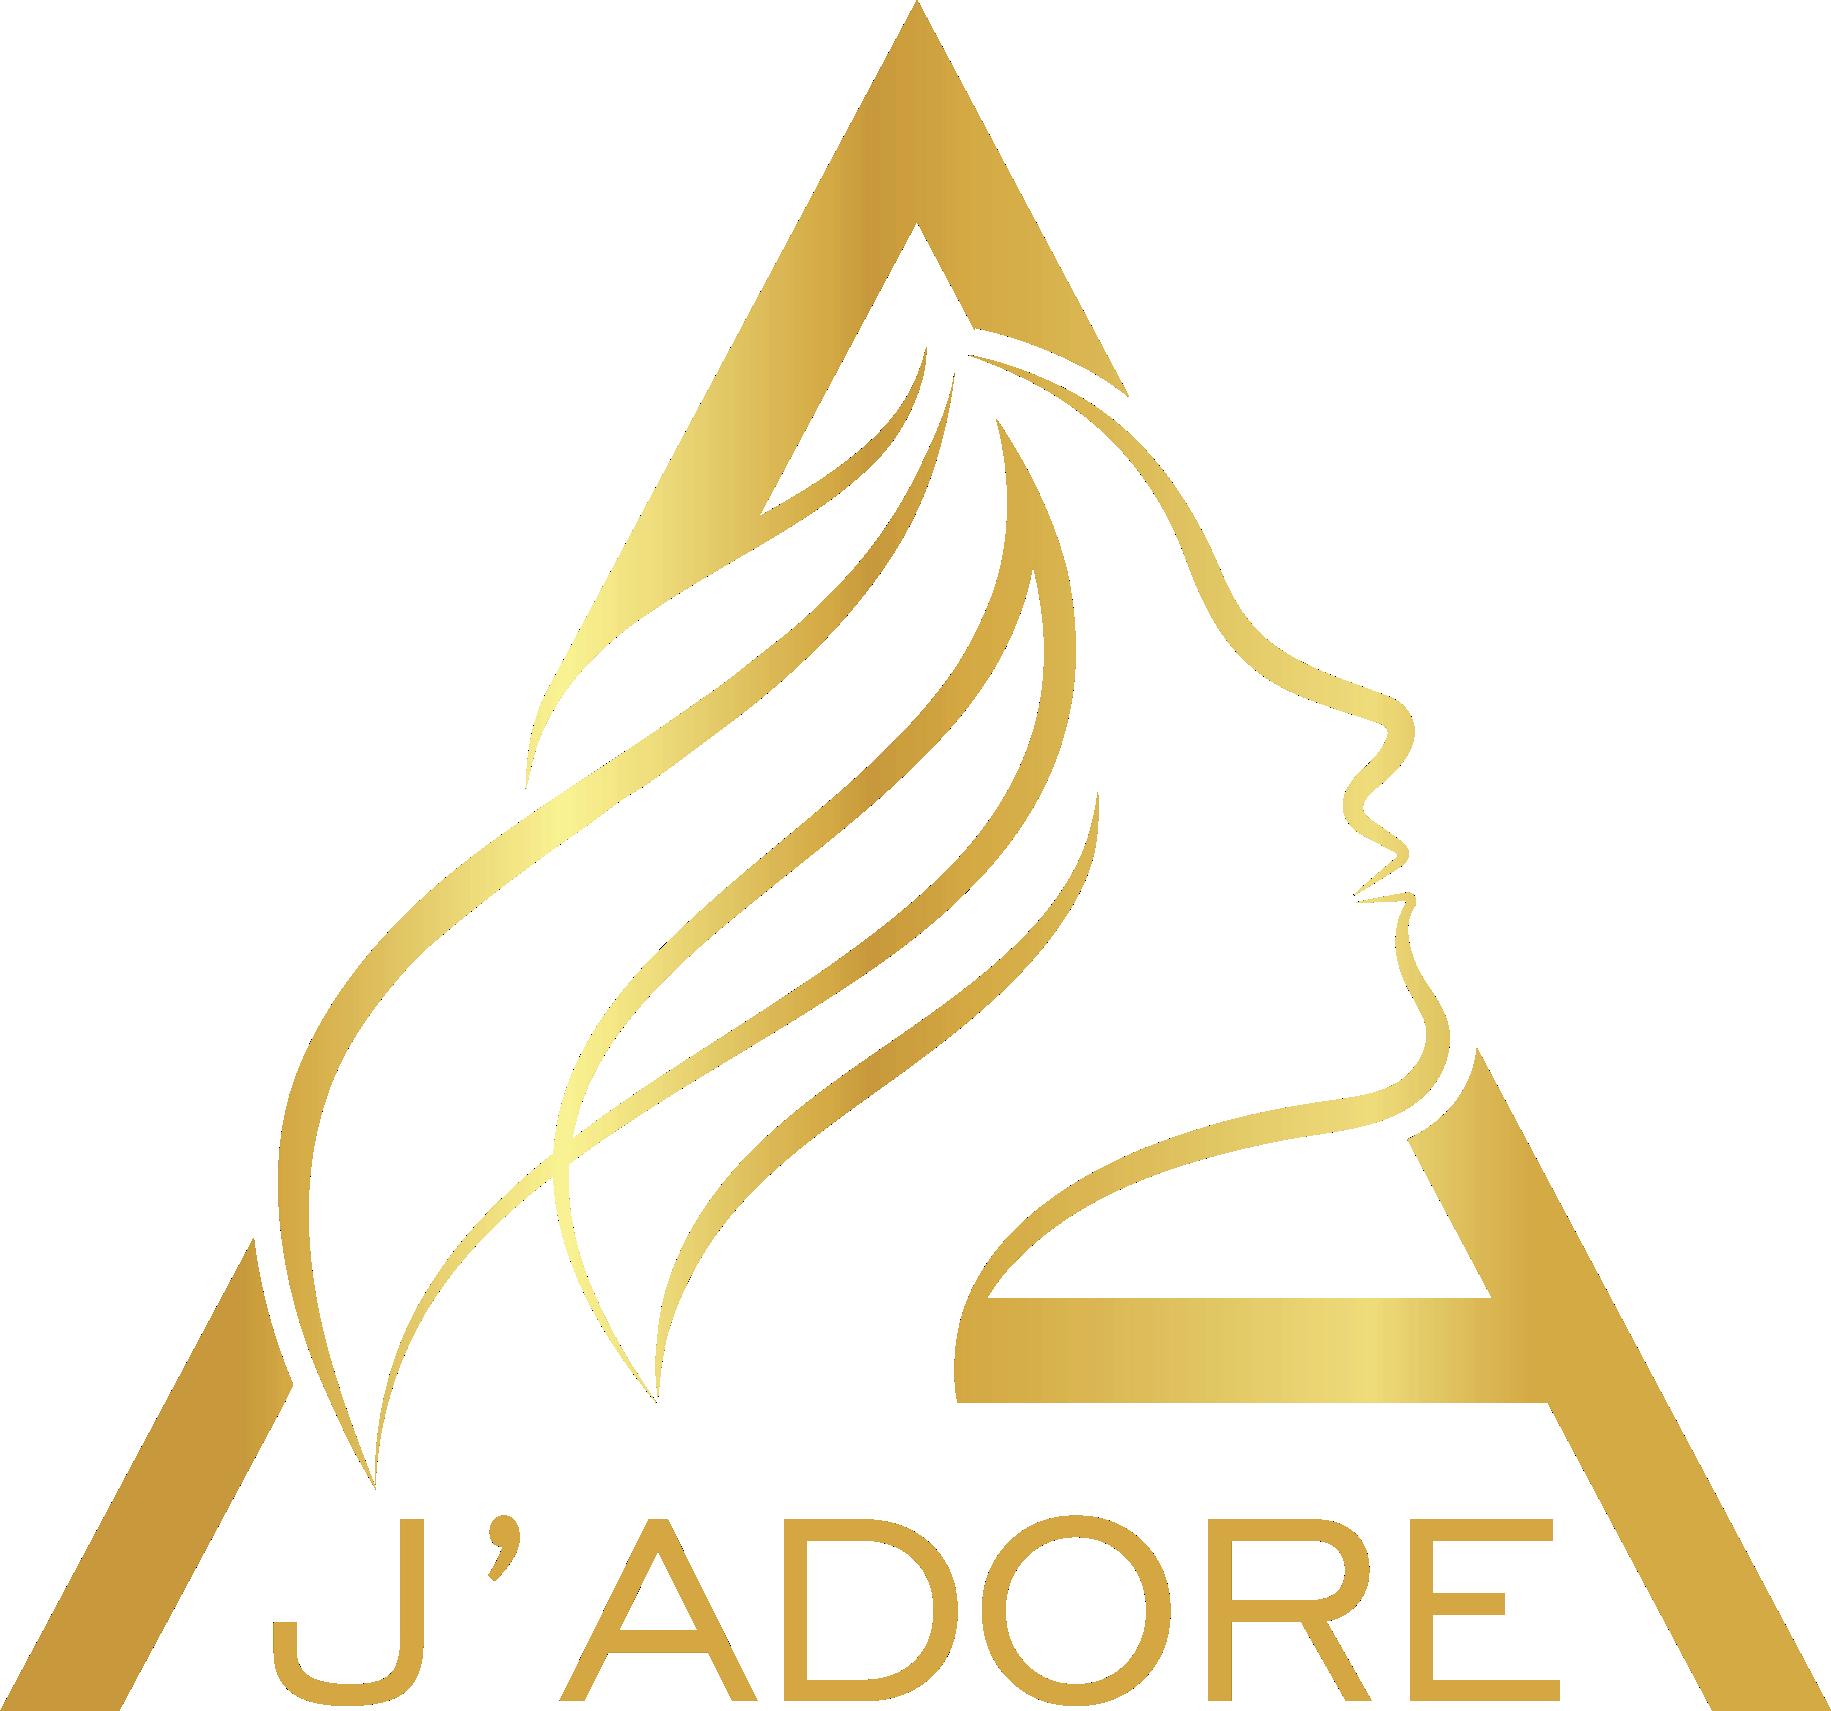 Jadore logo 2 test